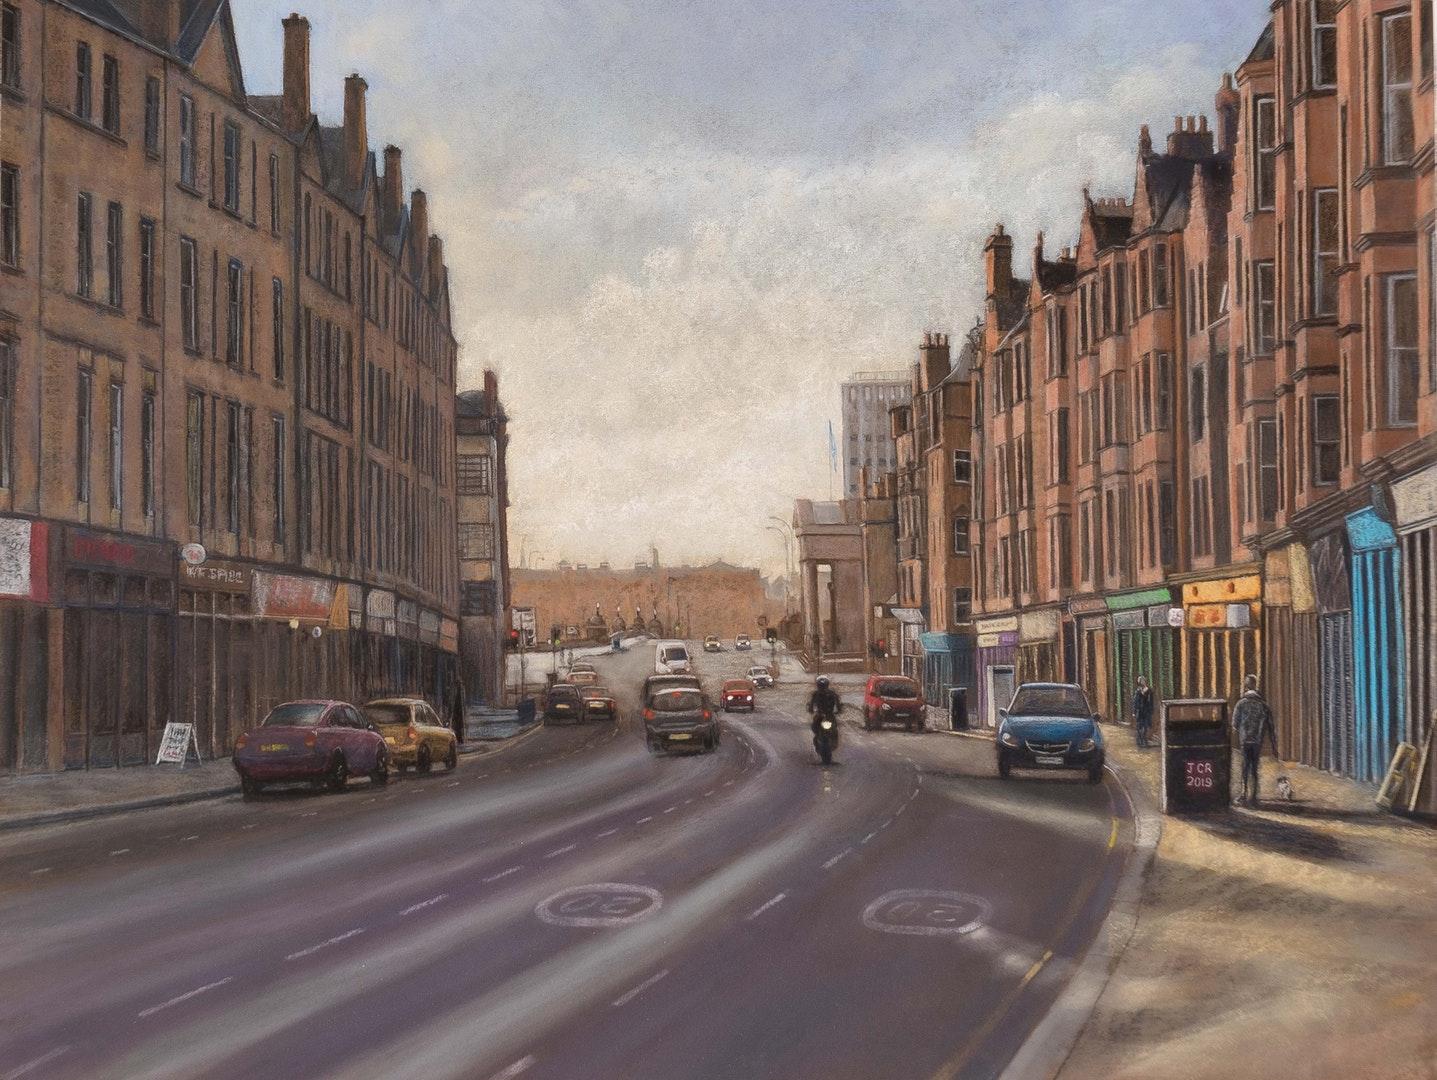 'The Saltmarket', John Rowland, Soft pastel on paper, 46 x 60 x 3 cm